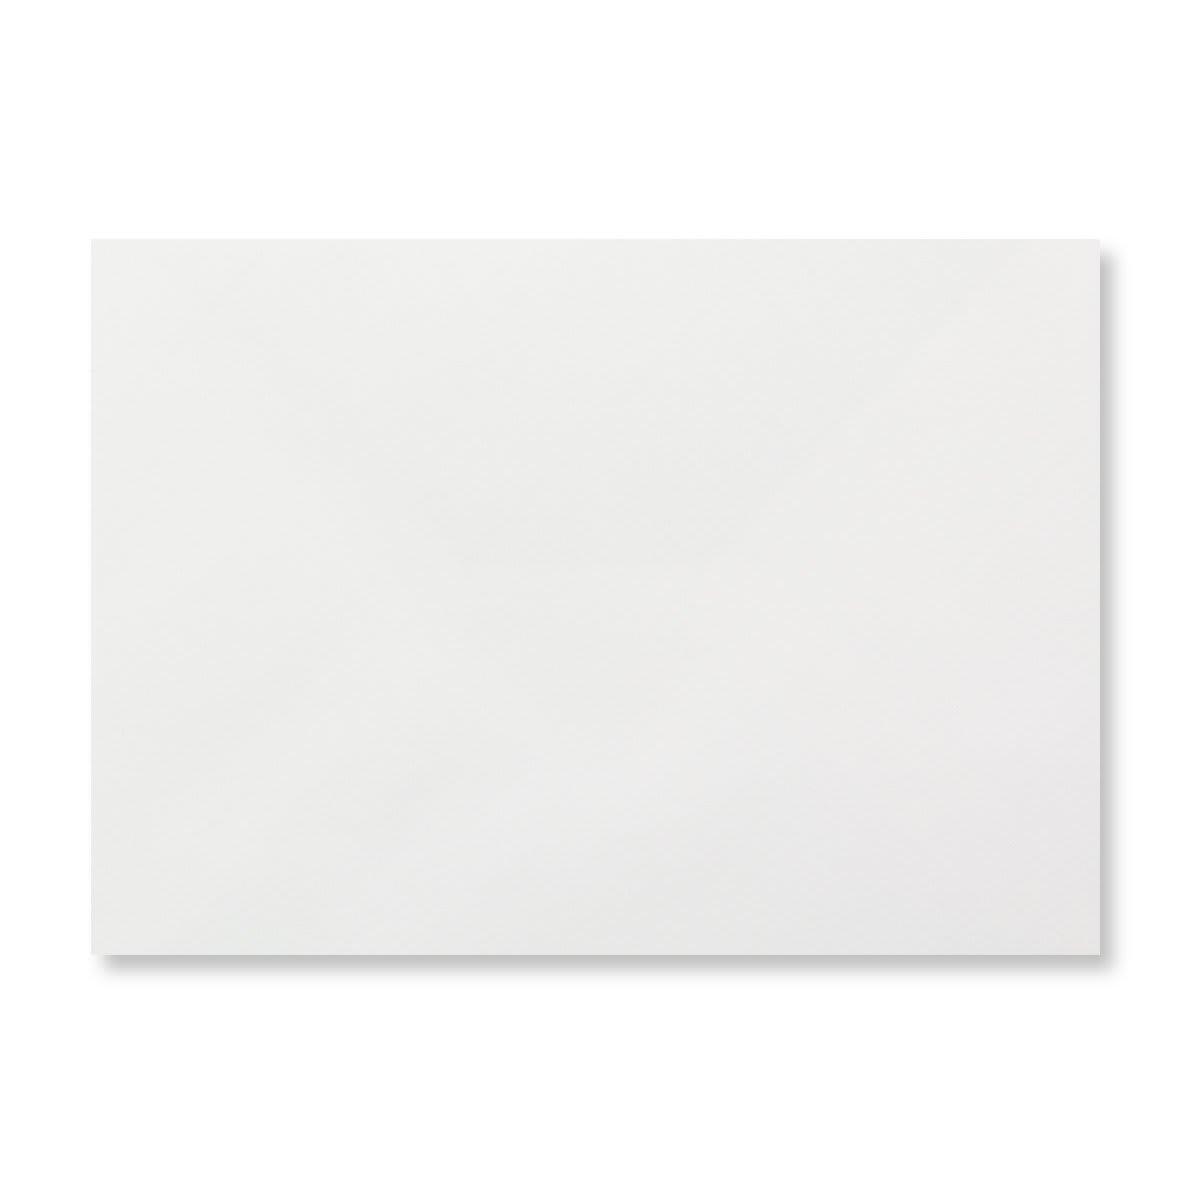 WHITE LAID 125 x 175mm ENVELOPES